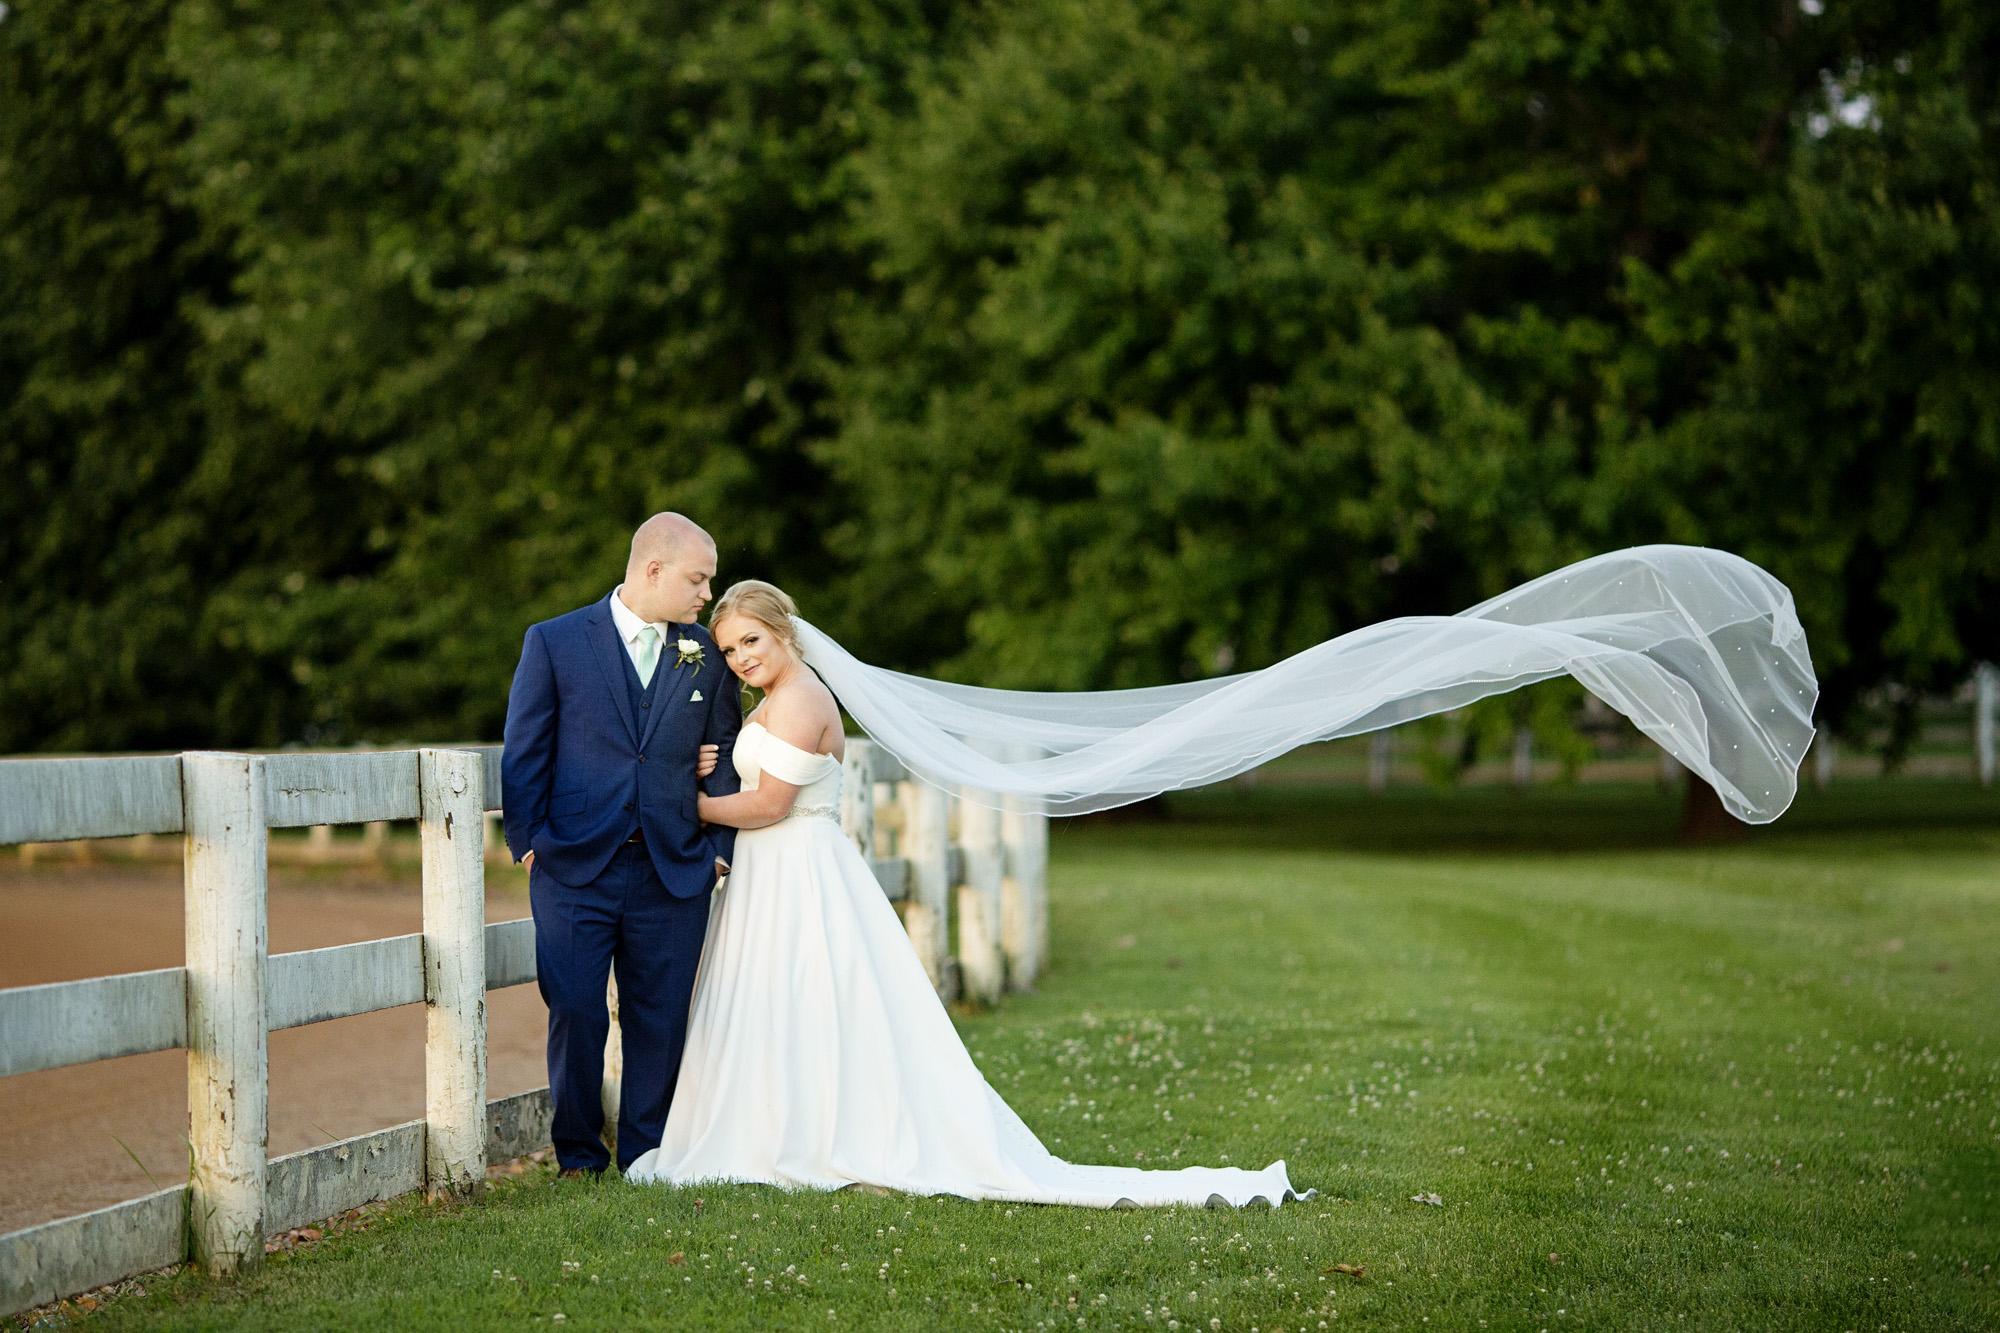 Seriously_Sabrina_Photography_Lexington_Kentucky_Pax_Christi_Round_Barn_Wedding_Beath_73.jpg